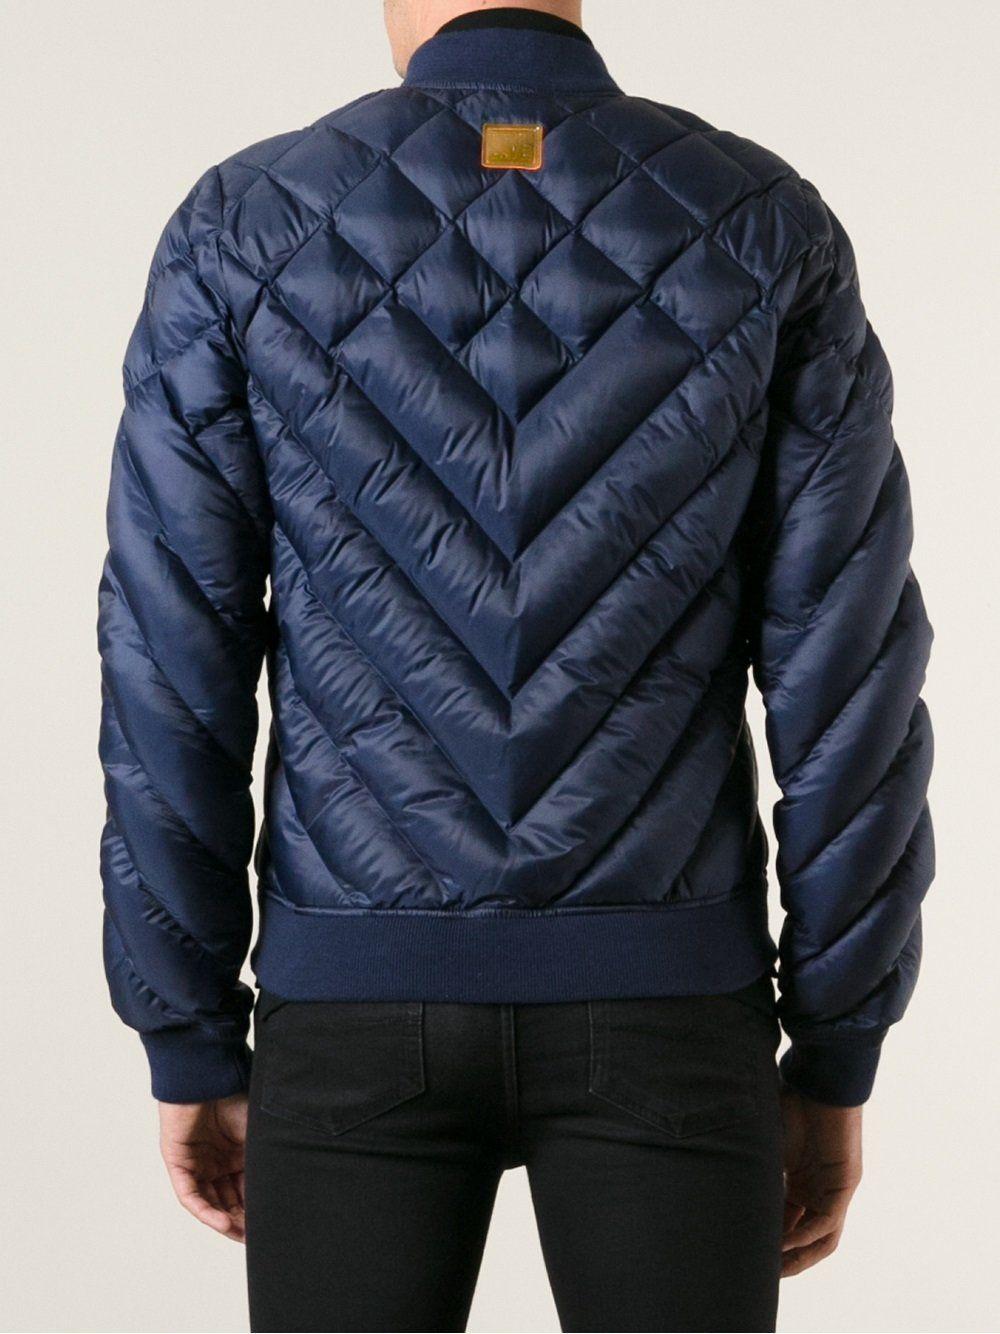 Lacoste Live quilted jacket Мужской наряд, Мужские